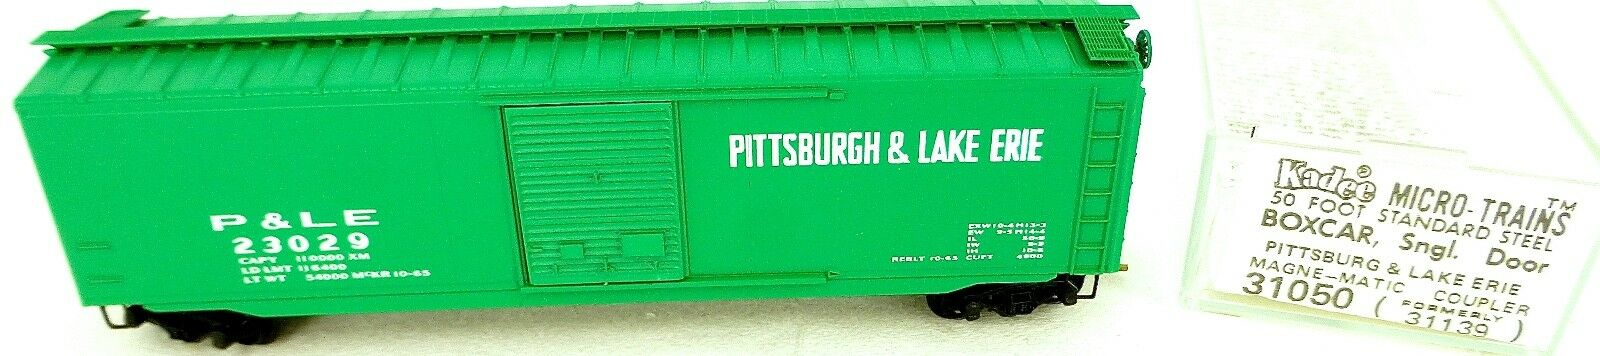 50´ Estándar BoxCoche Pittsburgh Erie 23029 Micro Trains Linea 31050 N 1 160 C Å